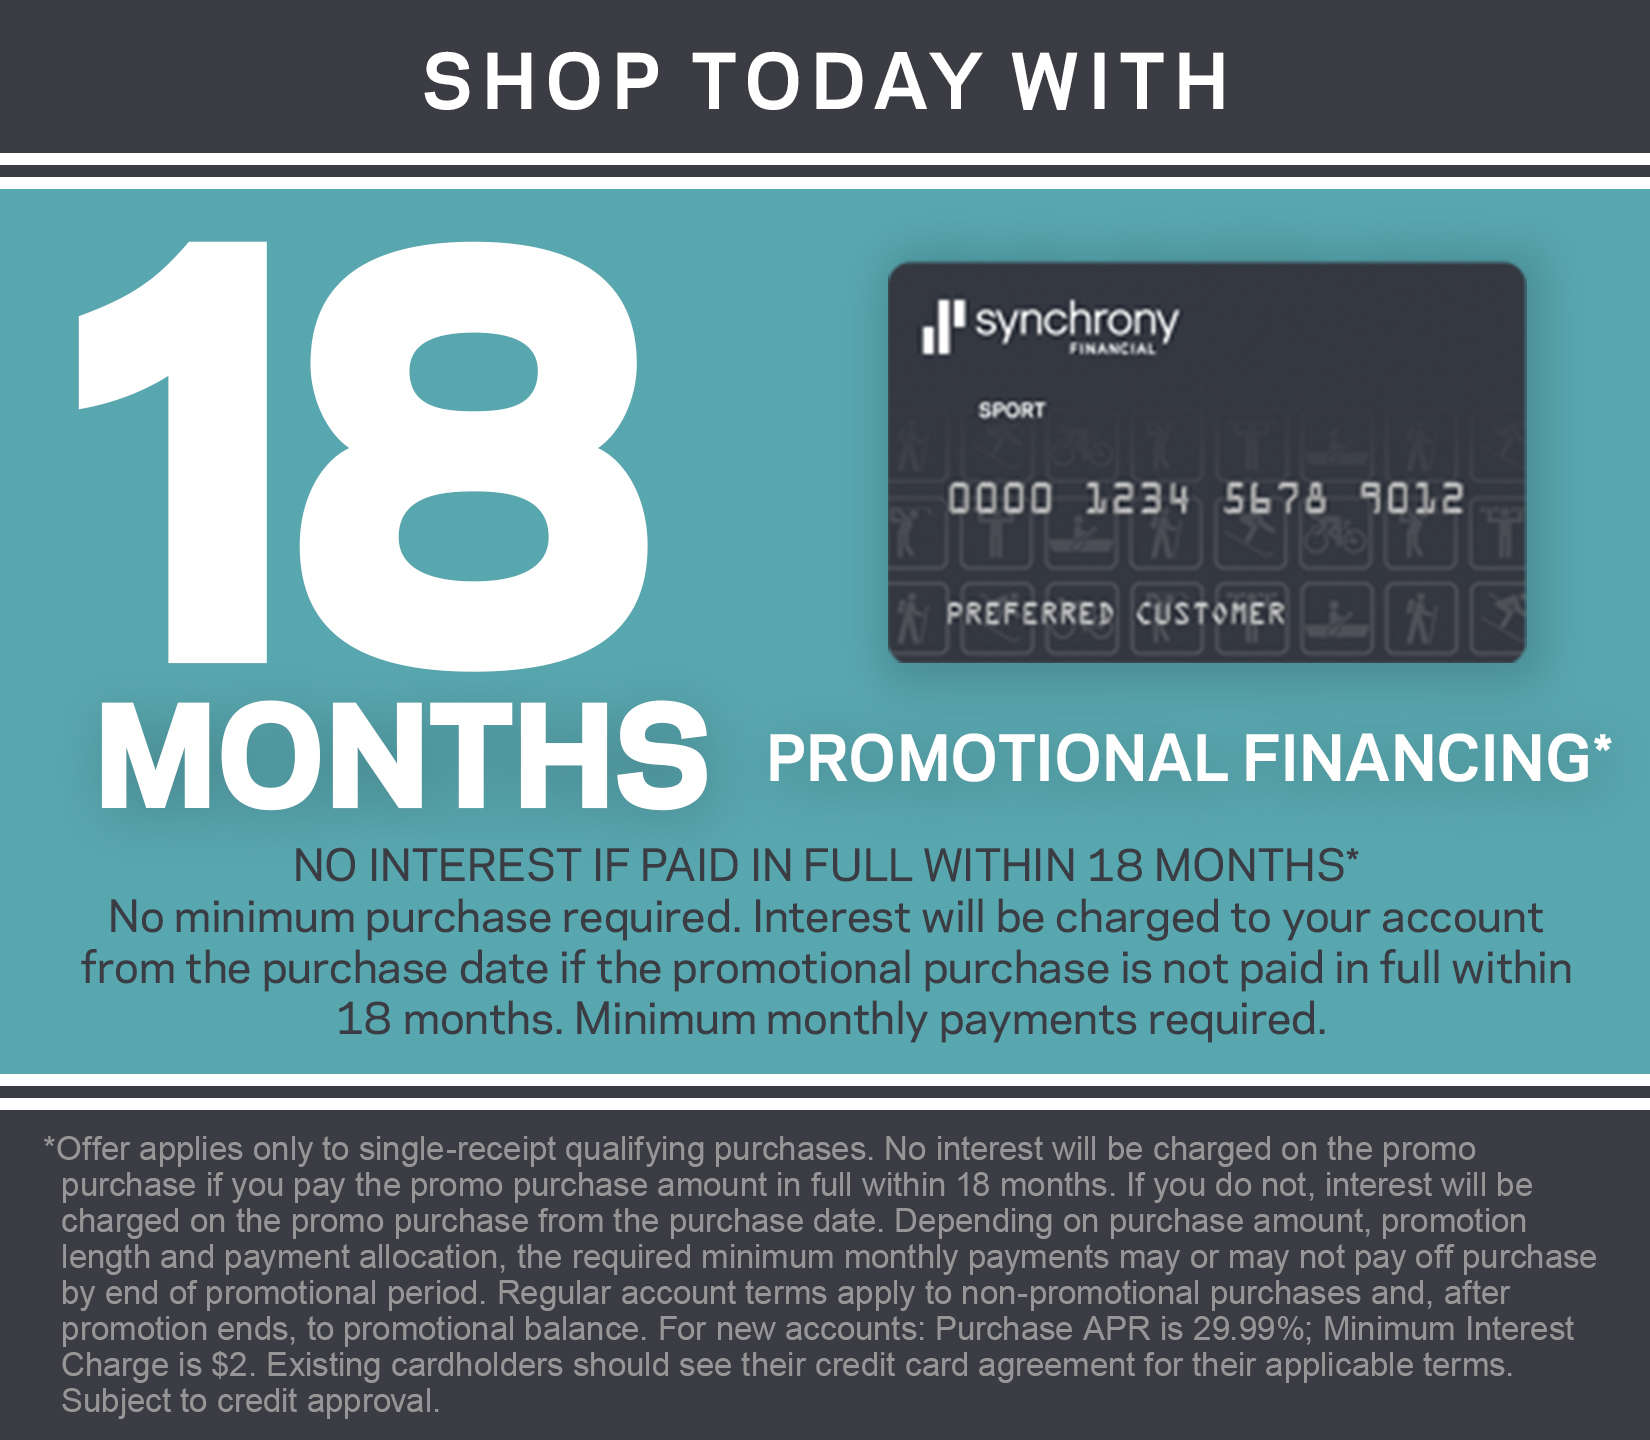 18 months financing